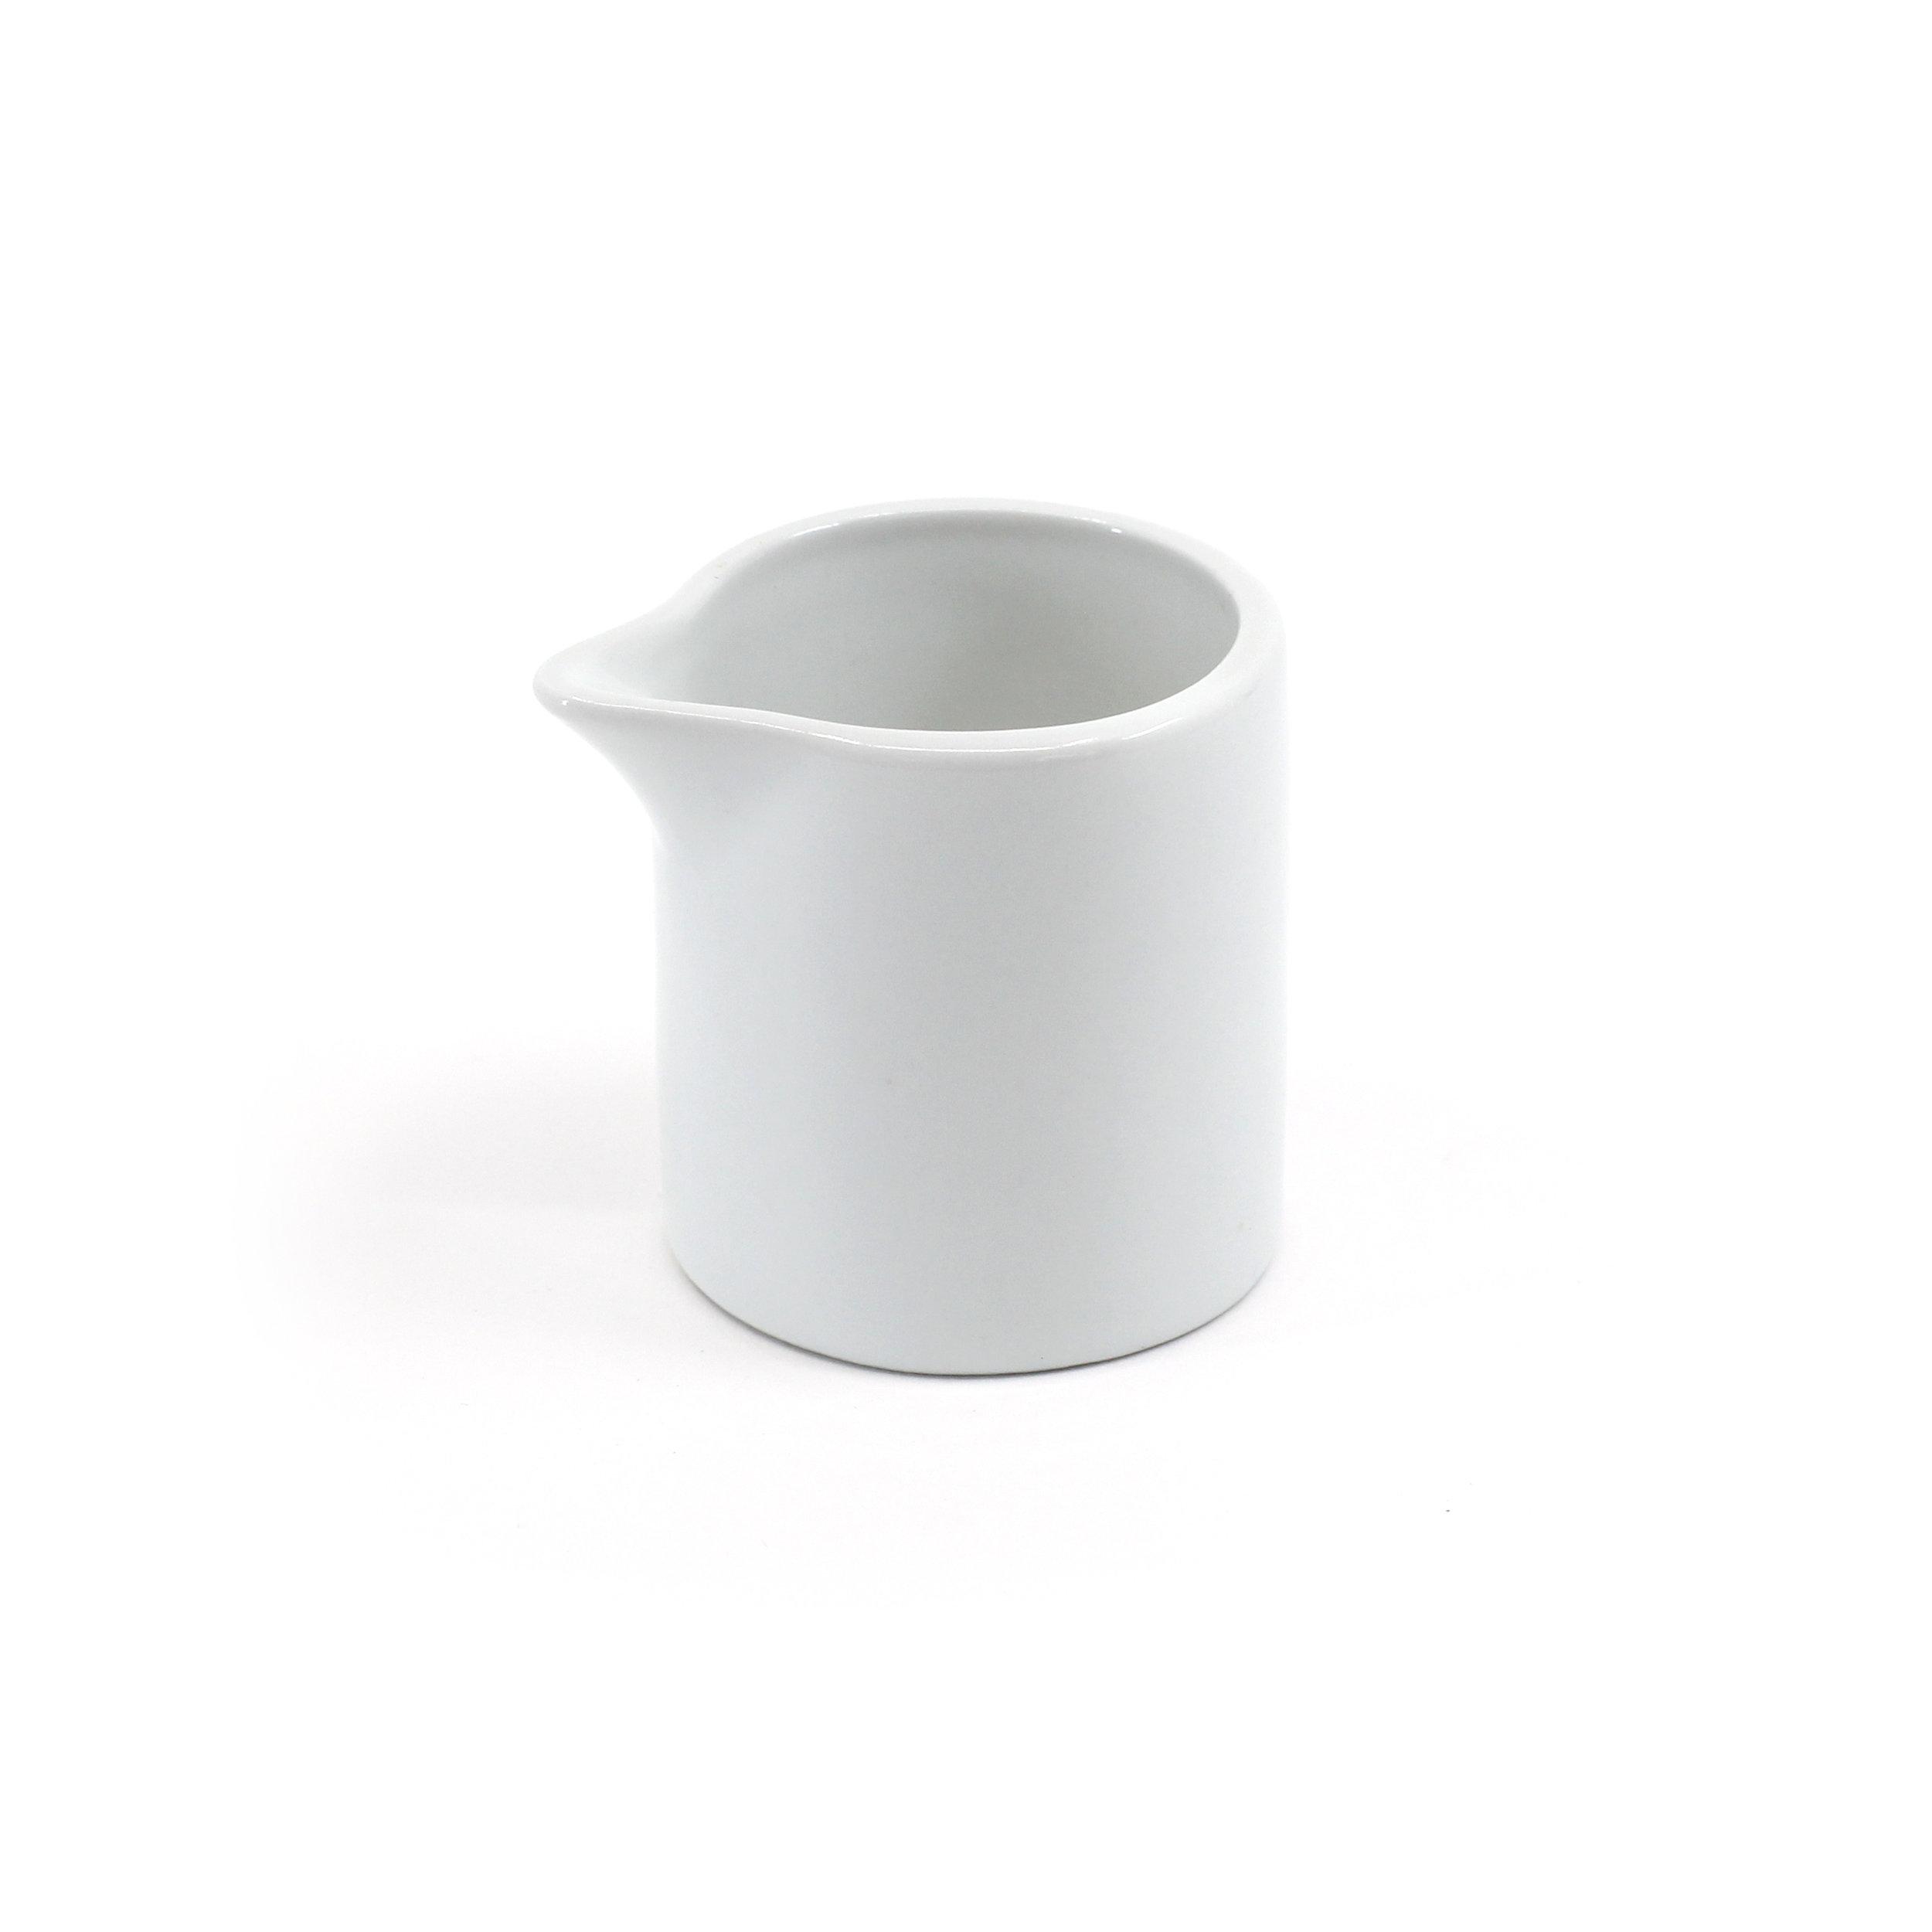 Cylindrical Ceramic Jug